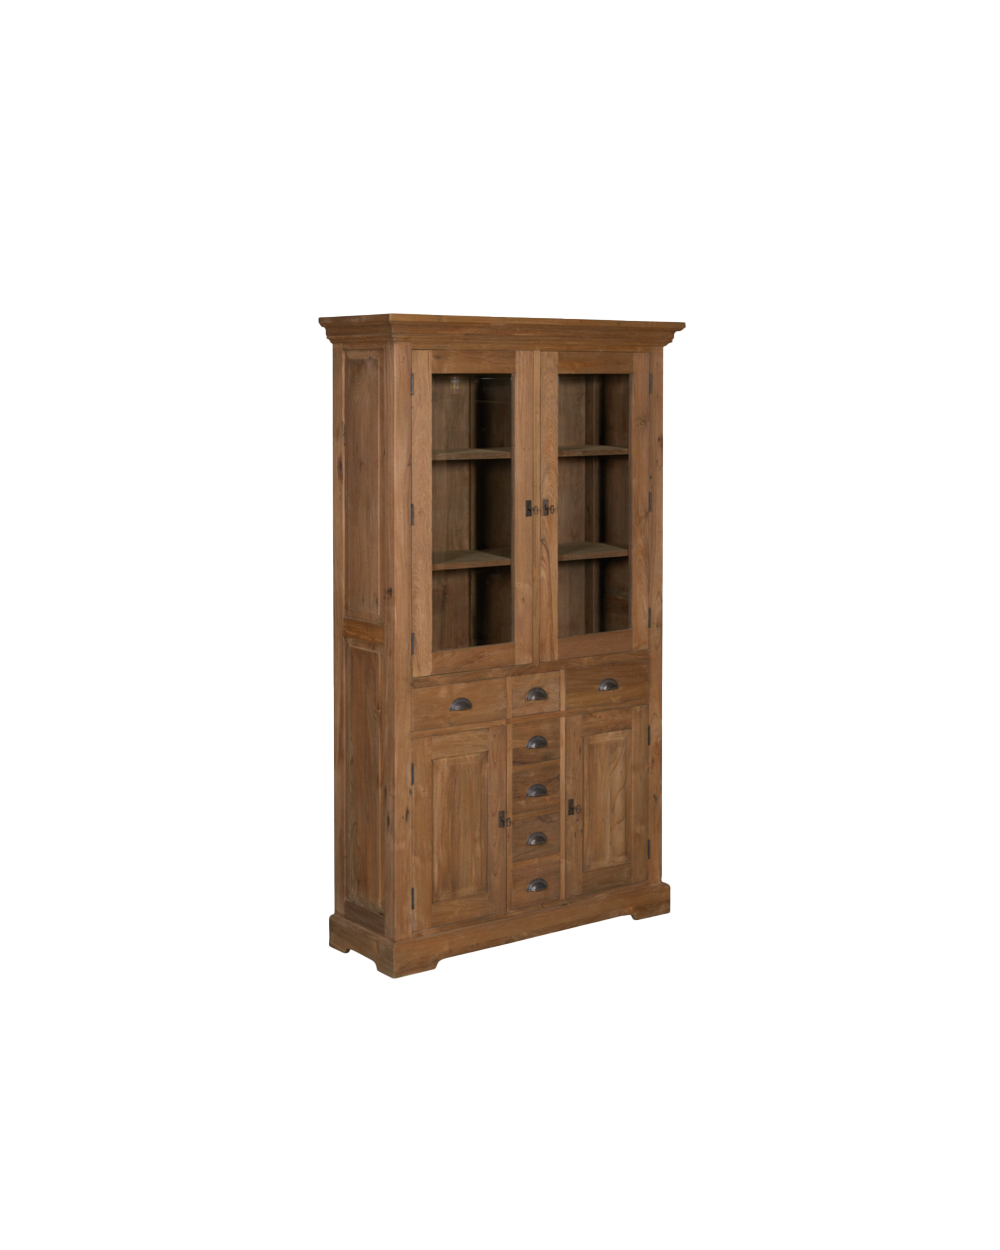 Bologna vitrine cabinet